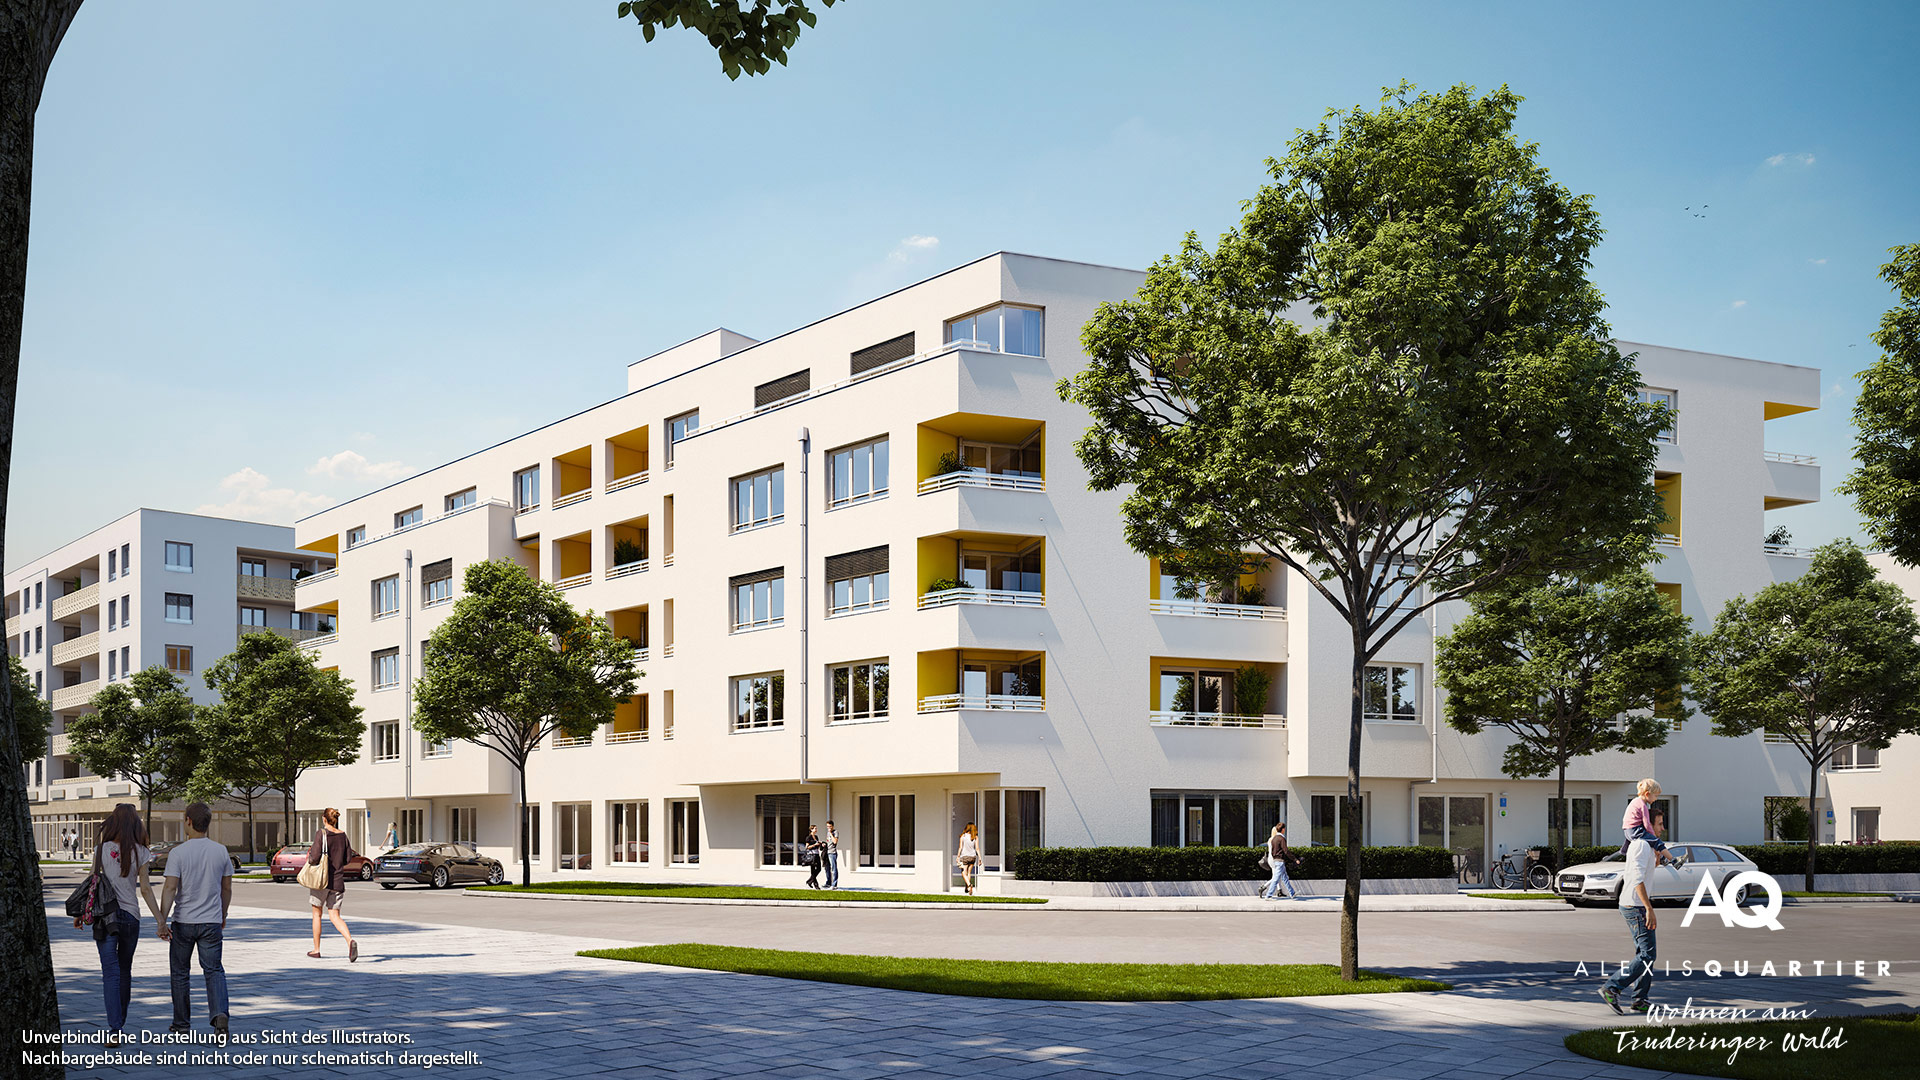 Immobilie Alexisquartier - Wohnen am Truderinger Wald - Illustration 2